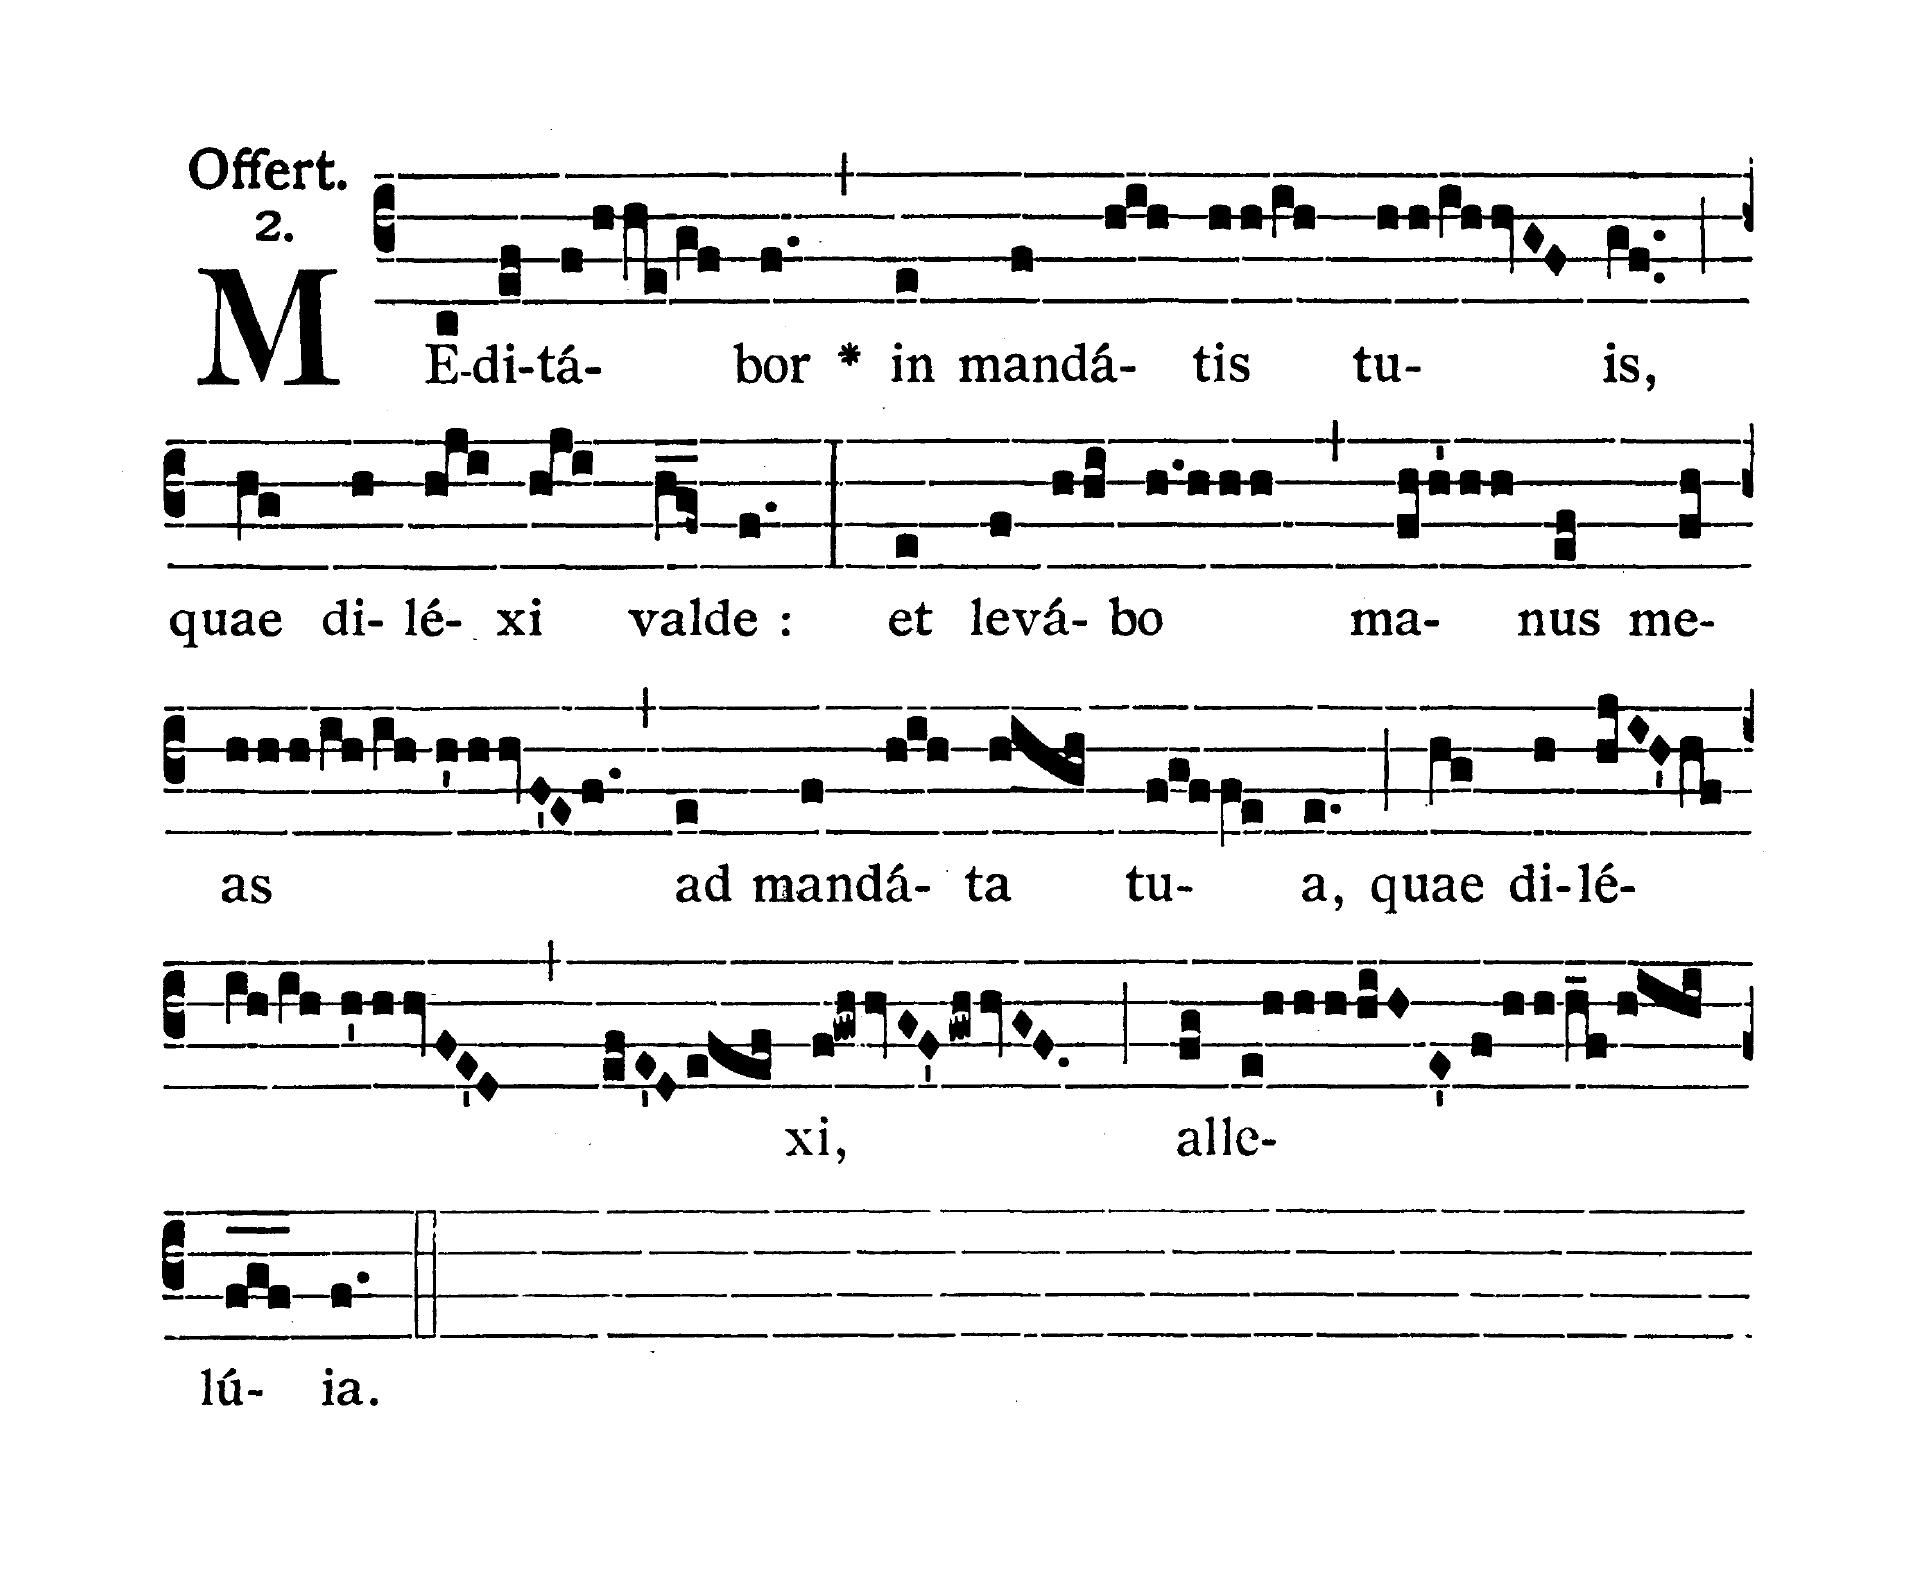 Feria quarta infra Octavam Pentecostes (Środa w oktawie Zesłania Ducha Świętego) - Offertorium (Meditabor in mandatis tuis)